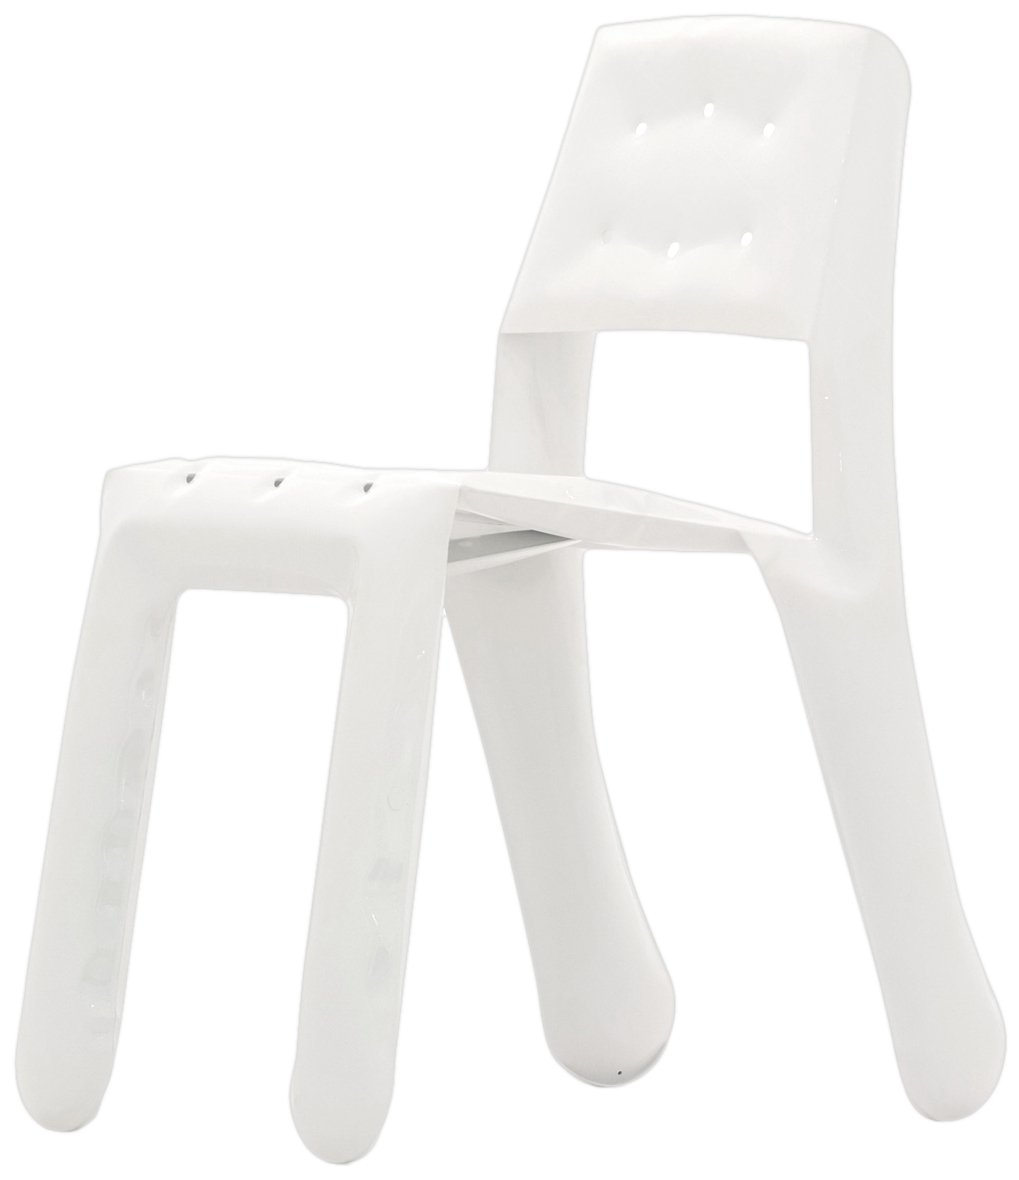 Zieta KC05/ALU/9003 Stuhl Chippensteel 0,5 Aluminium, weiß